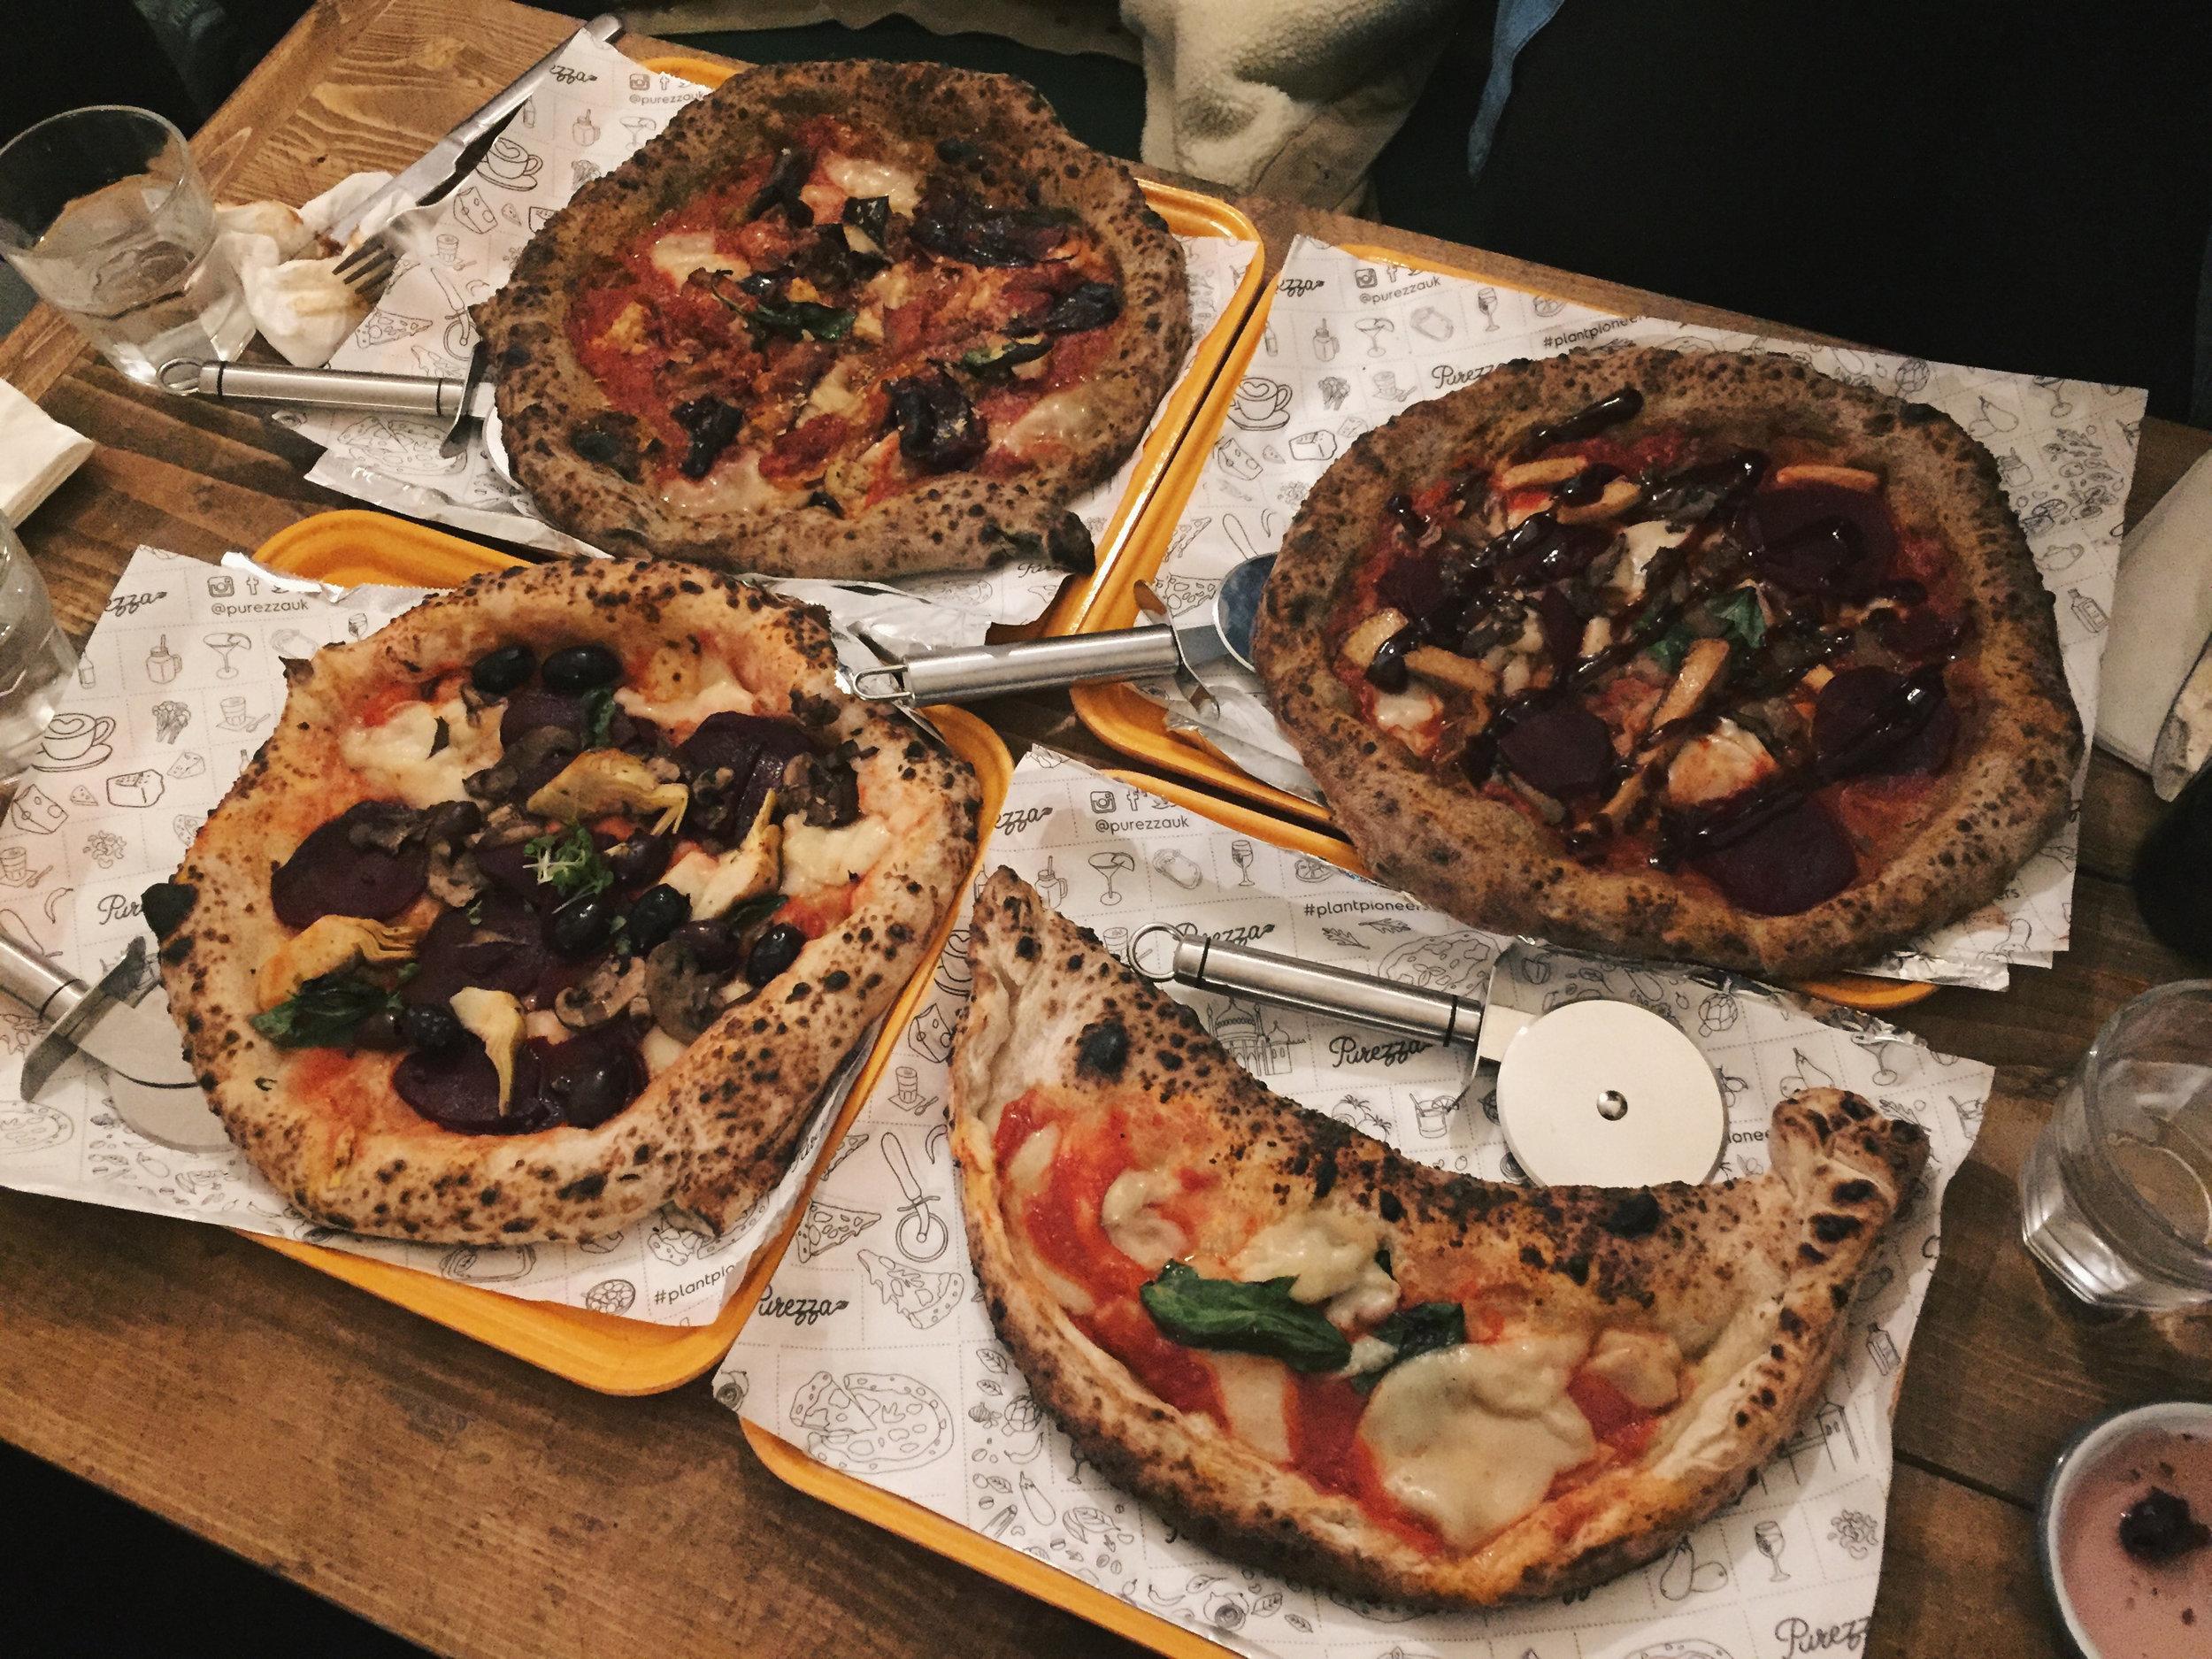 Bright Zine Ethical Lifestyle Purezza Brings Vegan Pizza